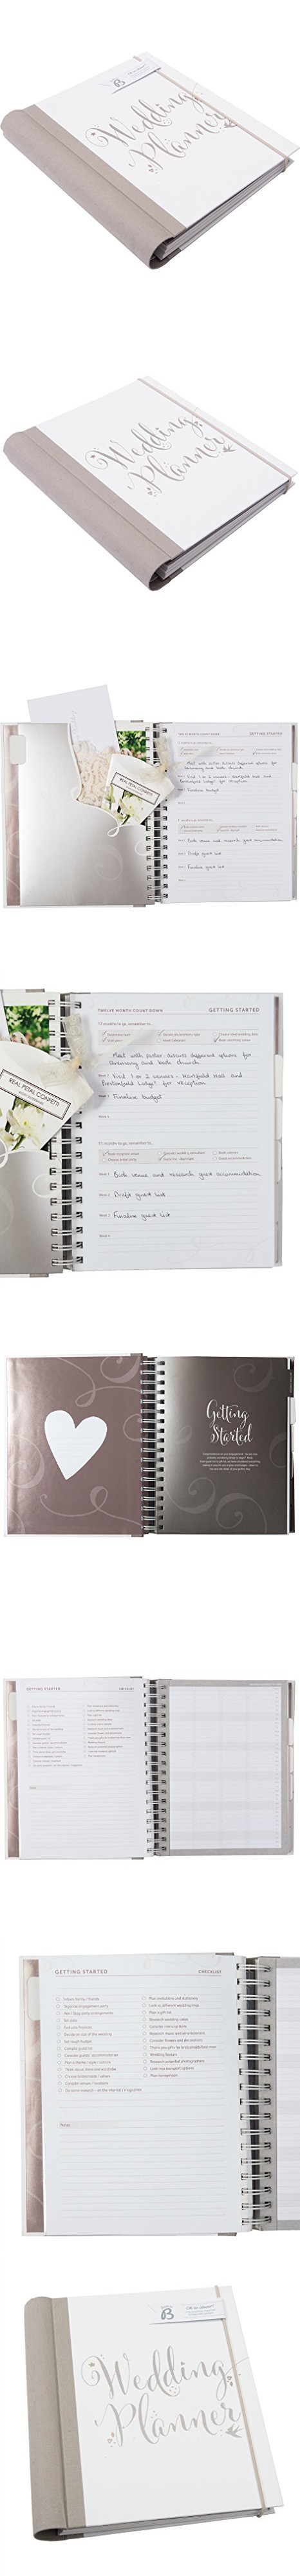 Busy B Bride To Script Wedding Planner